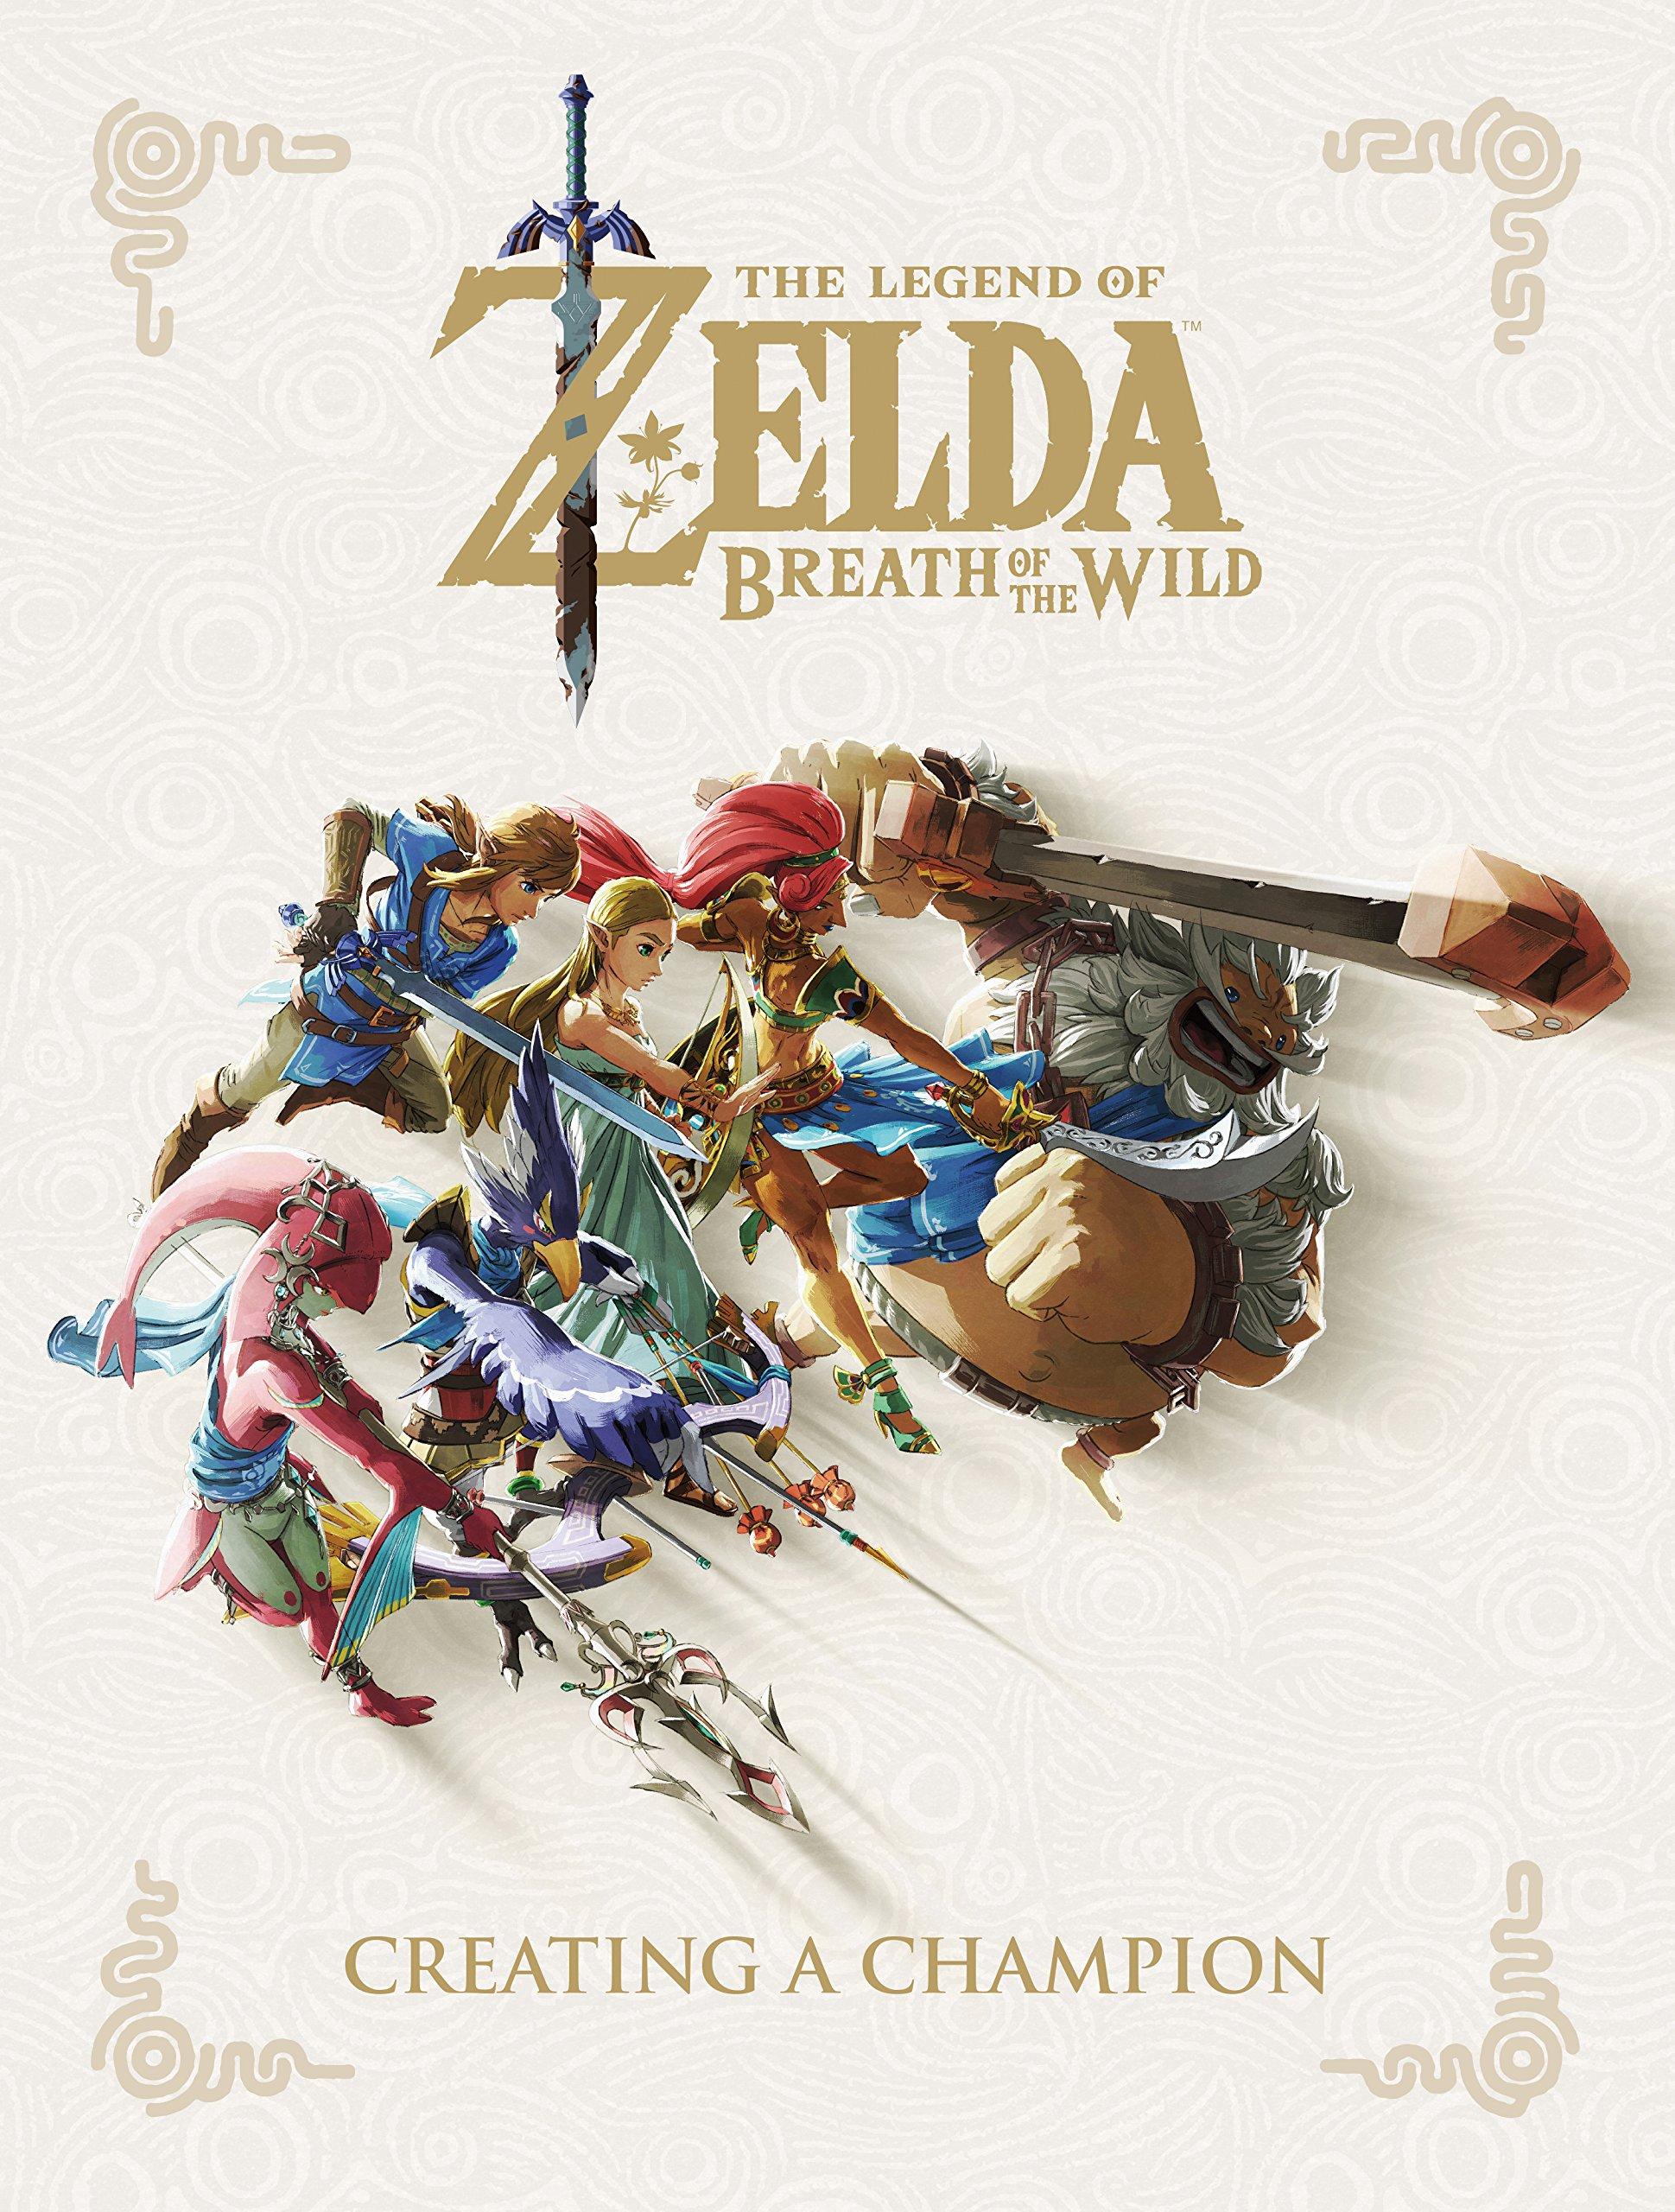 The Legend of Zelda: Breath of the Wild--Creating a Champion (Hardcover) $15.32 @ Amazon & Walmart